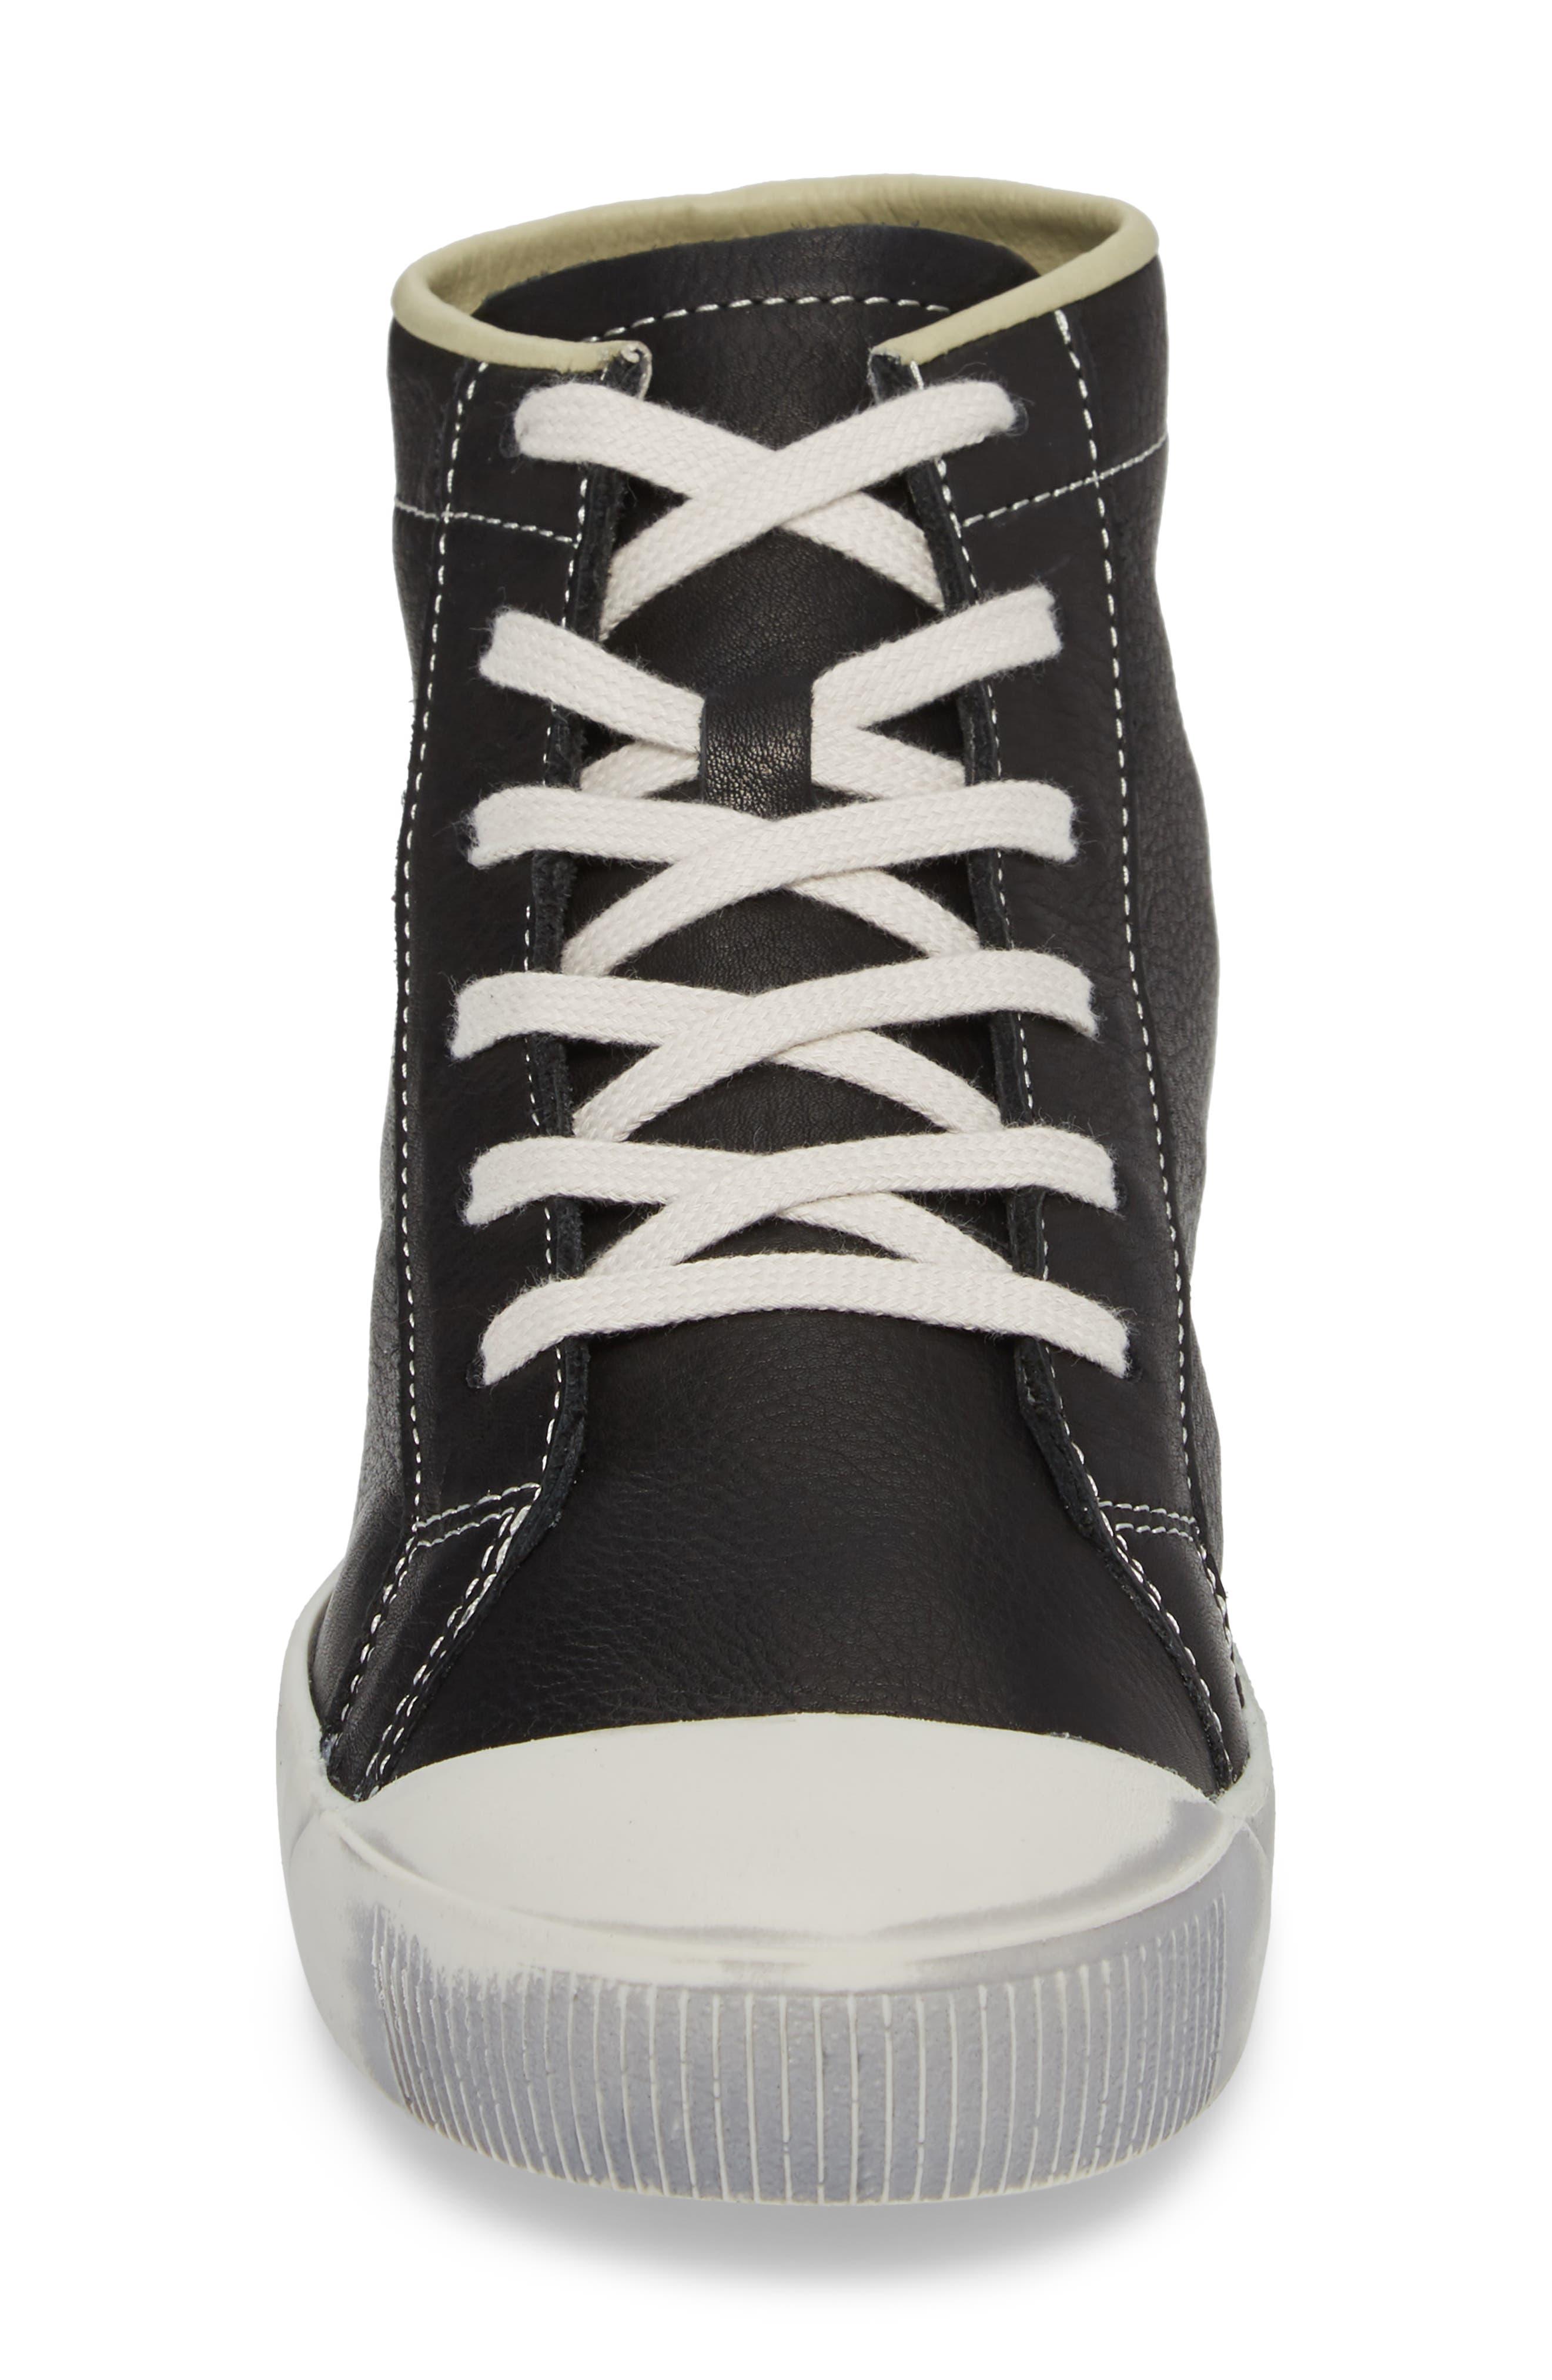 Kip High Top Sneaker,                             Alternate thumbnail 4, color,                             001